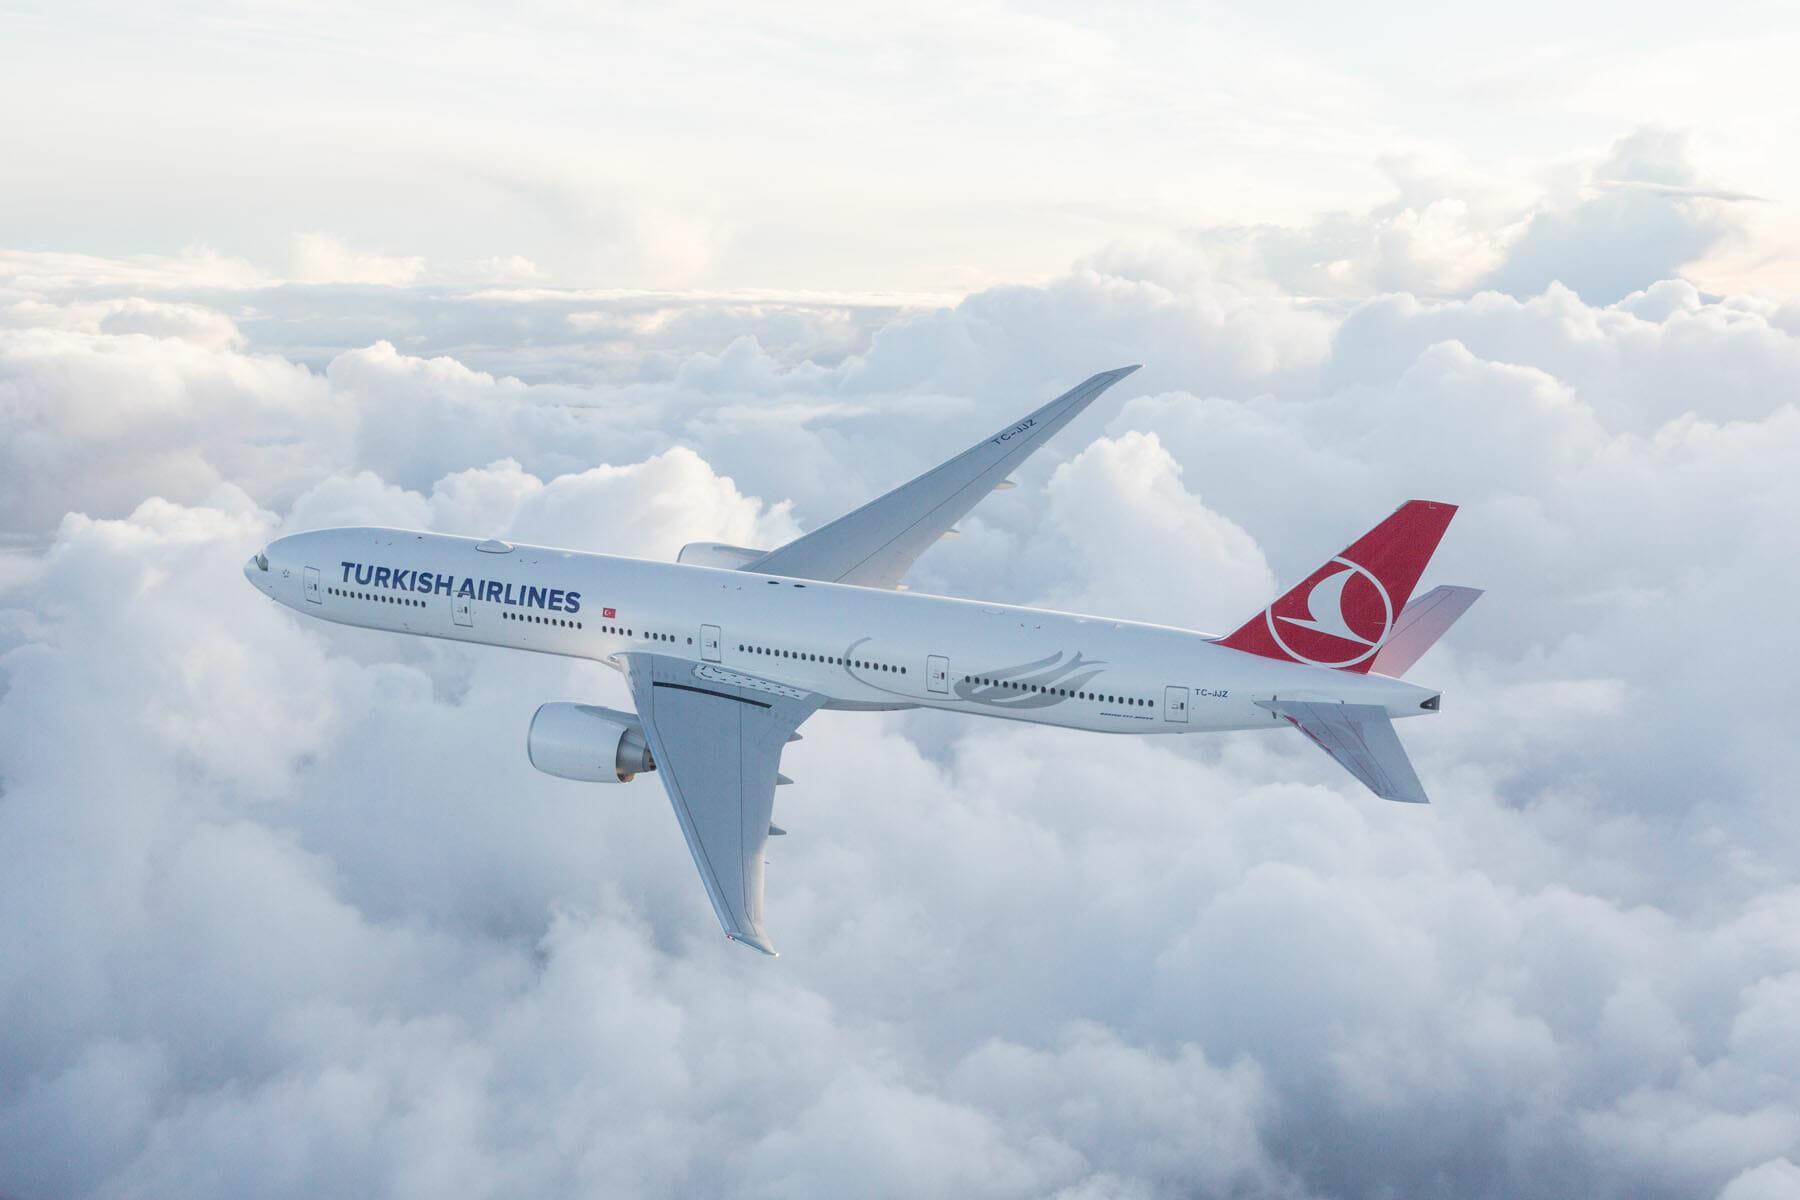 21d54304a2976220 - الخطوط الجوية التركية تطلق رحلات يومية بين أنطاليا ولندن